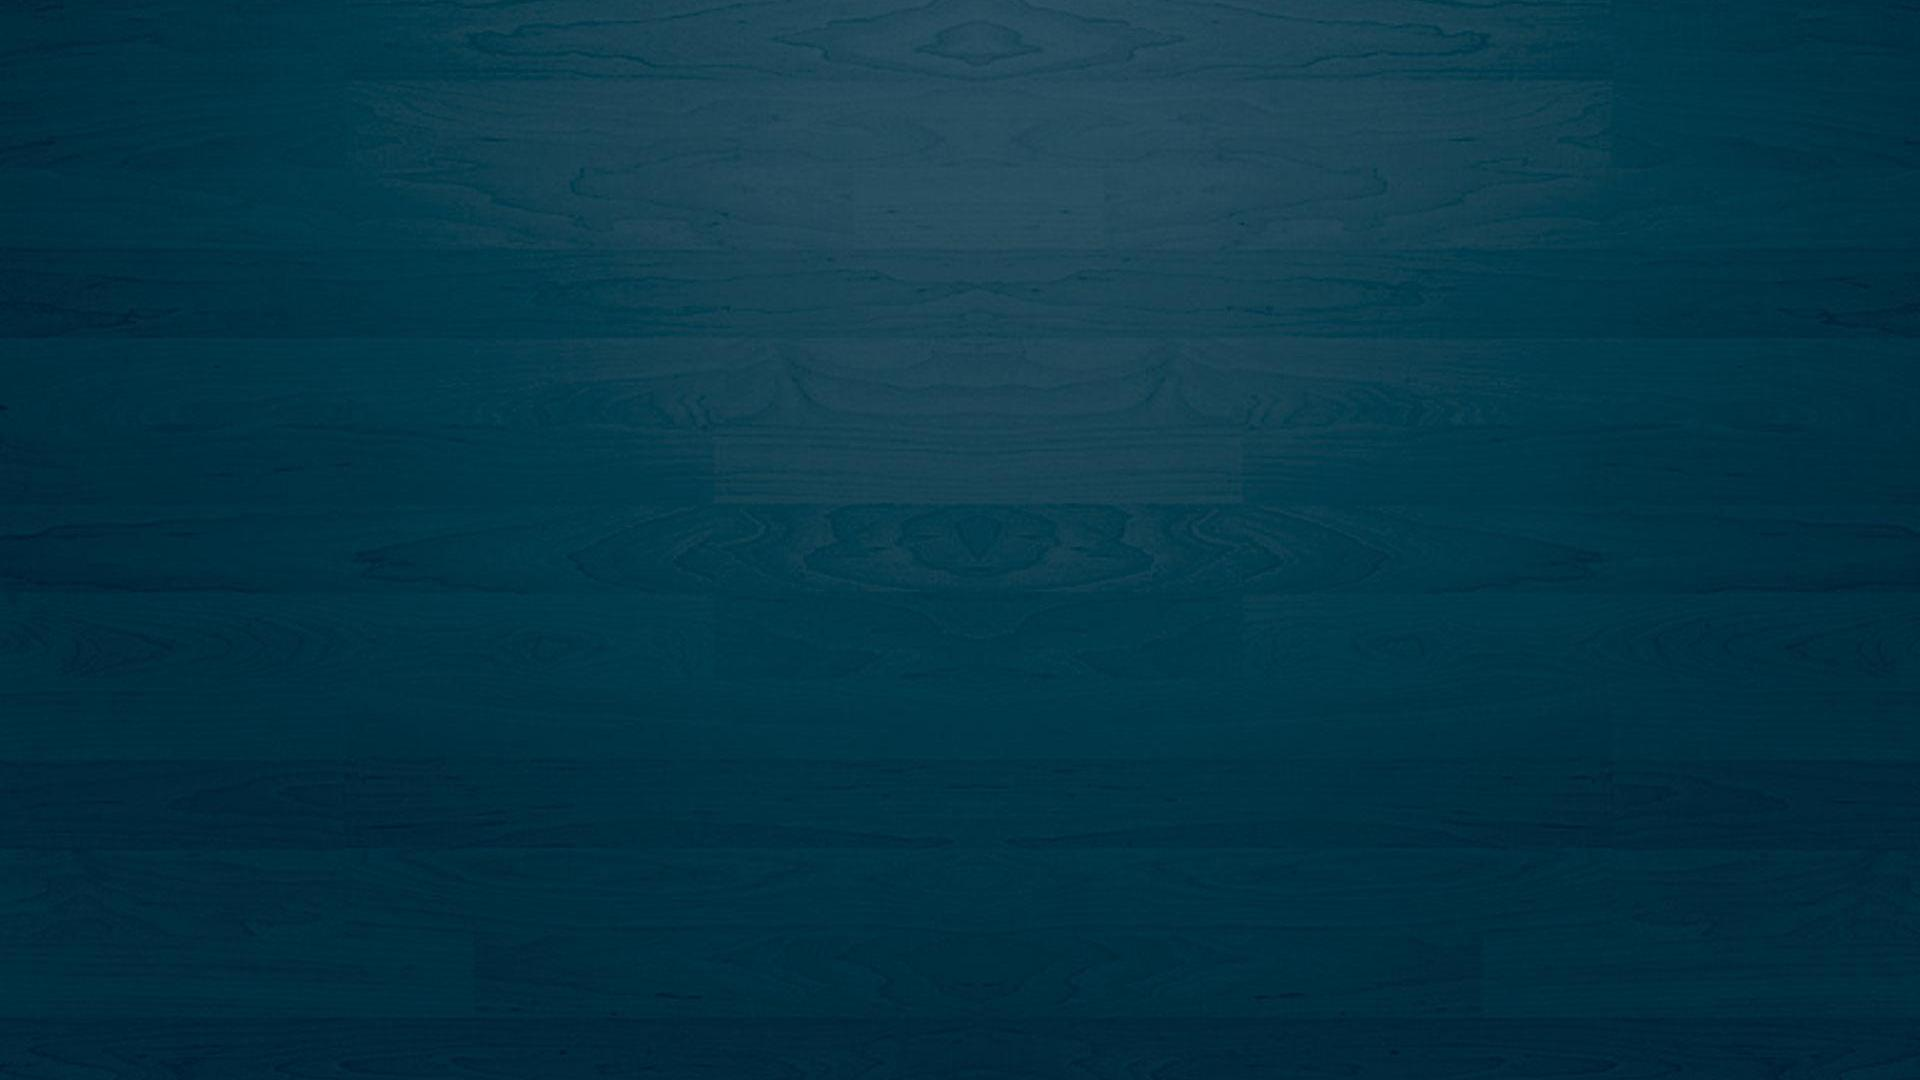 1920x1080 Blue Wood Pattern Wallpaper Blue Wood Blue Wallpapers 1920x1080